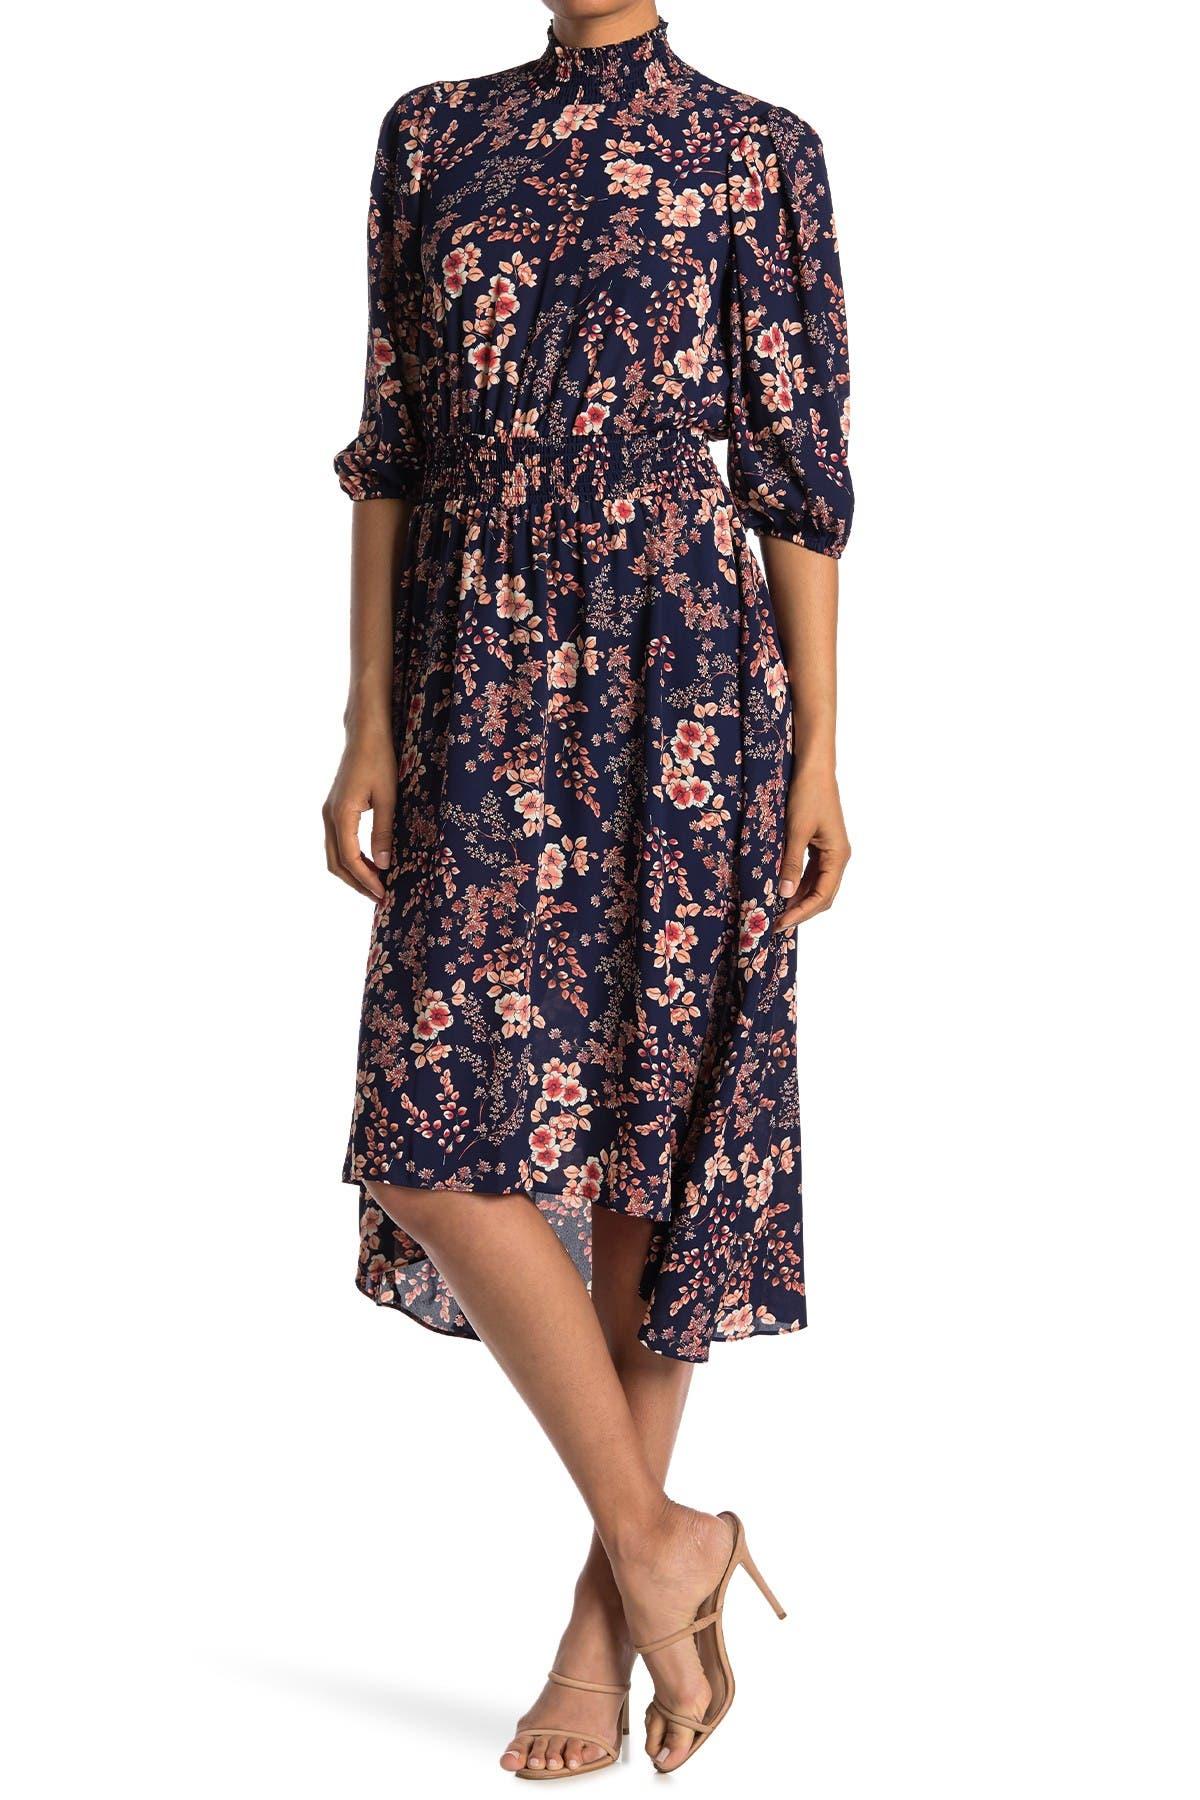 Image of NANETTE nanette lepore Smock Neck Long Sleeve Floral Print Waist Dress